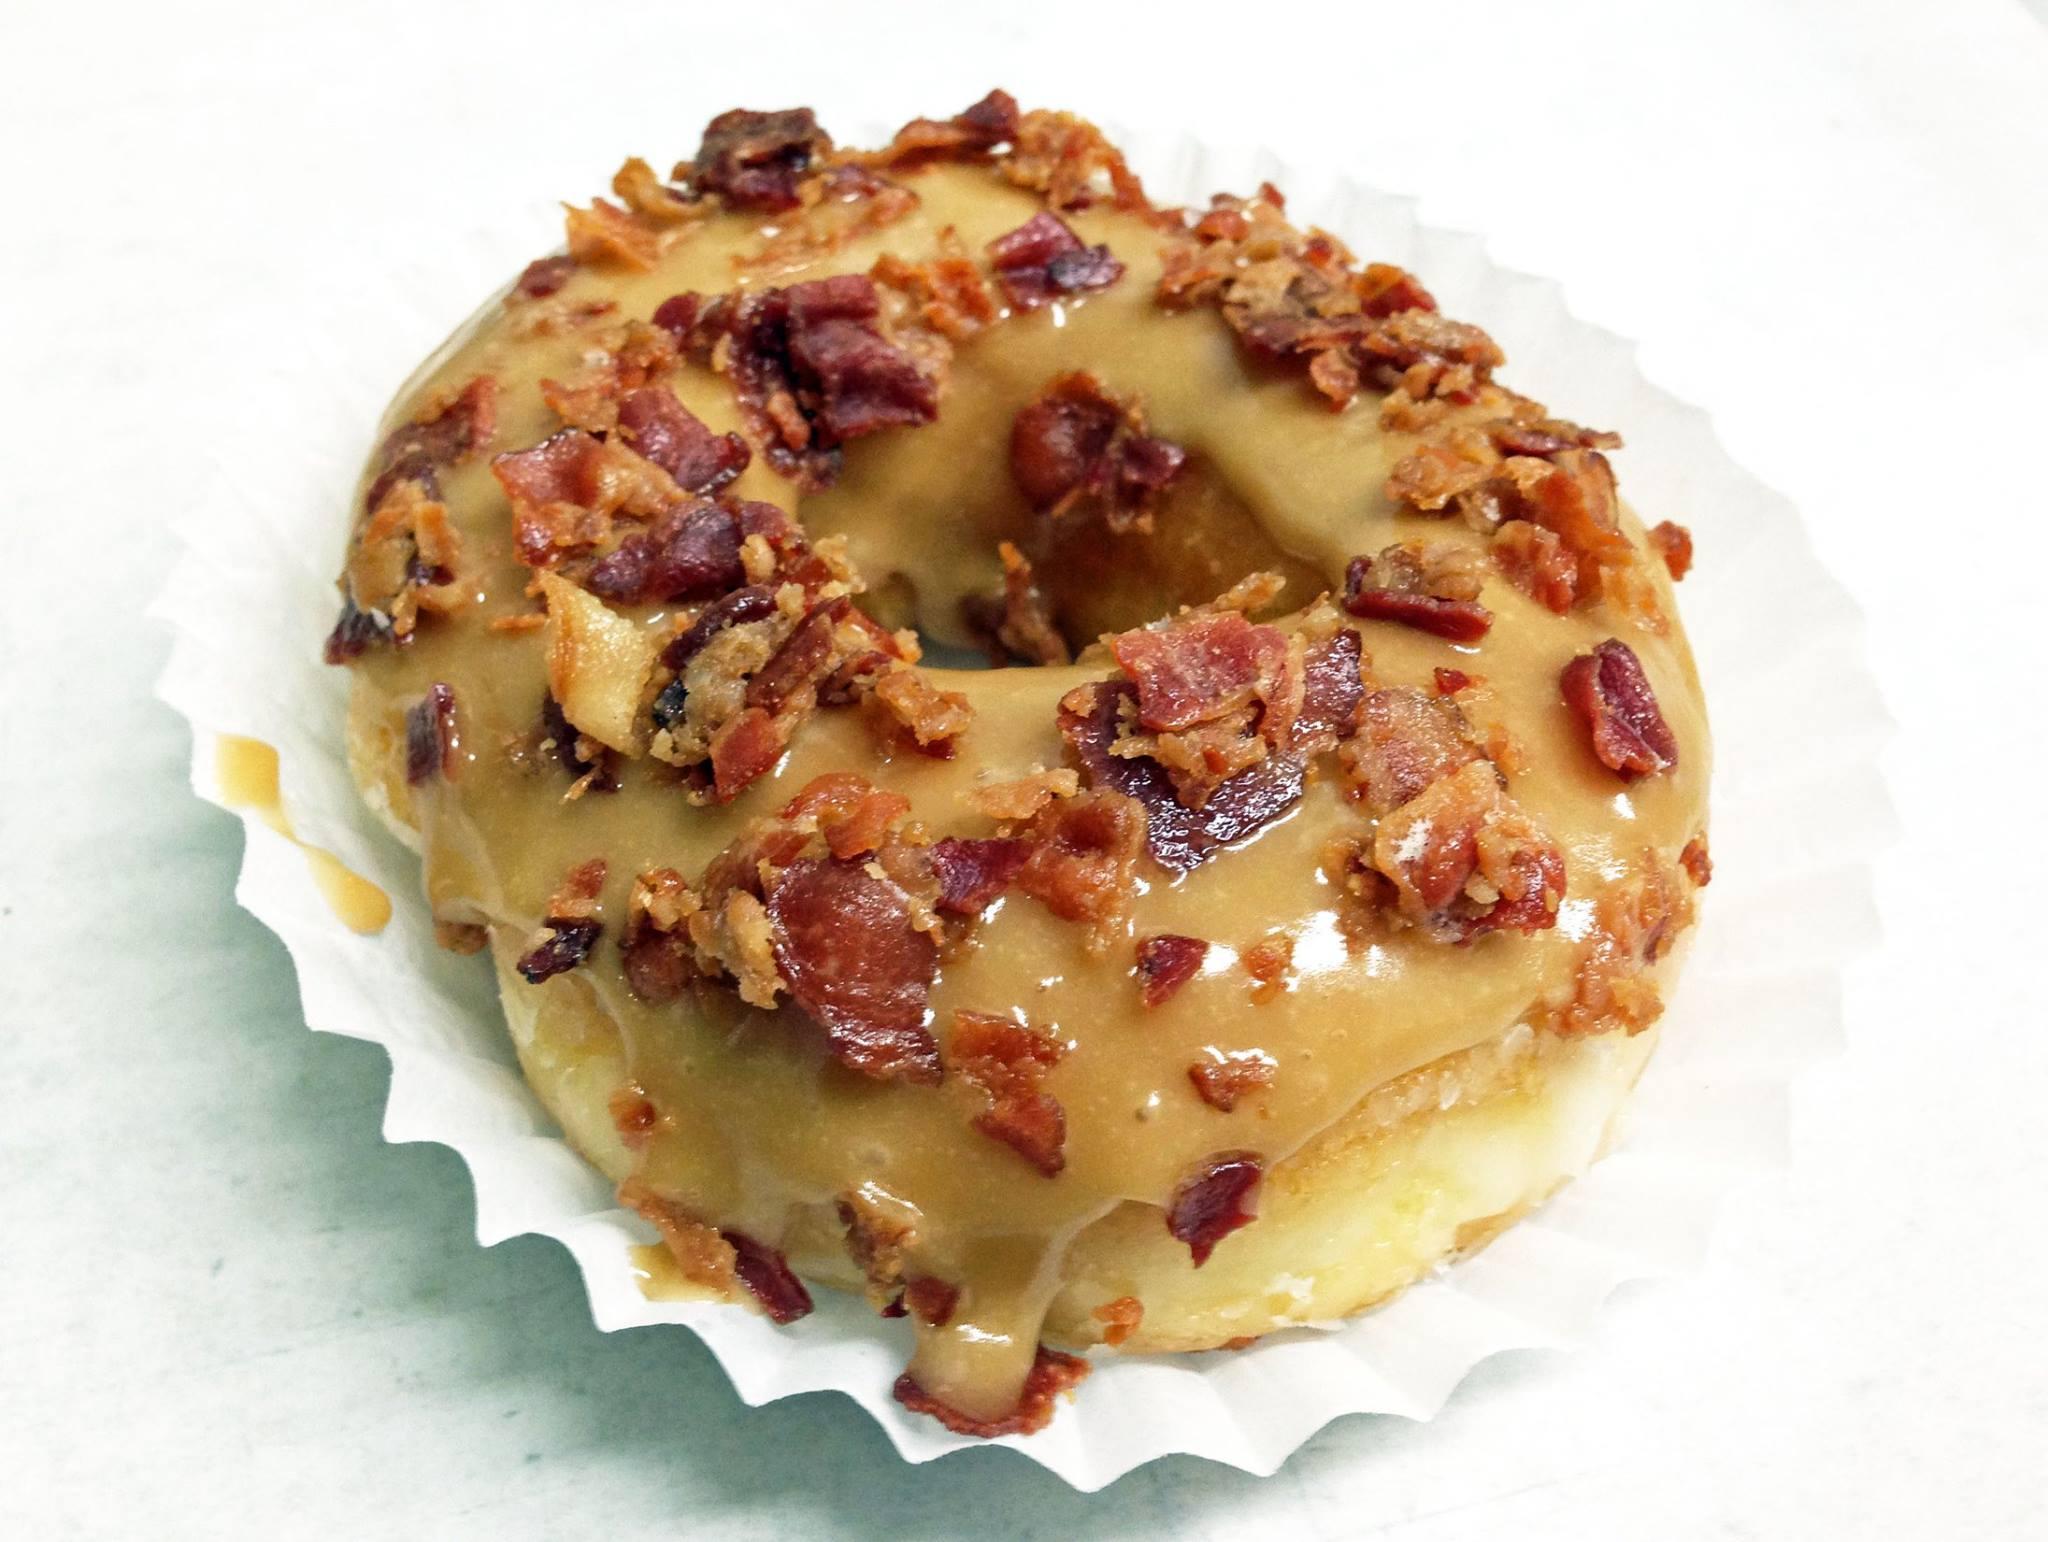 Photo Credit: Back Door Donuts Facebook Page